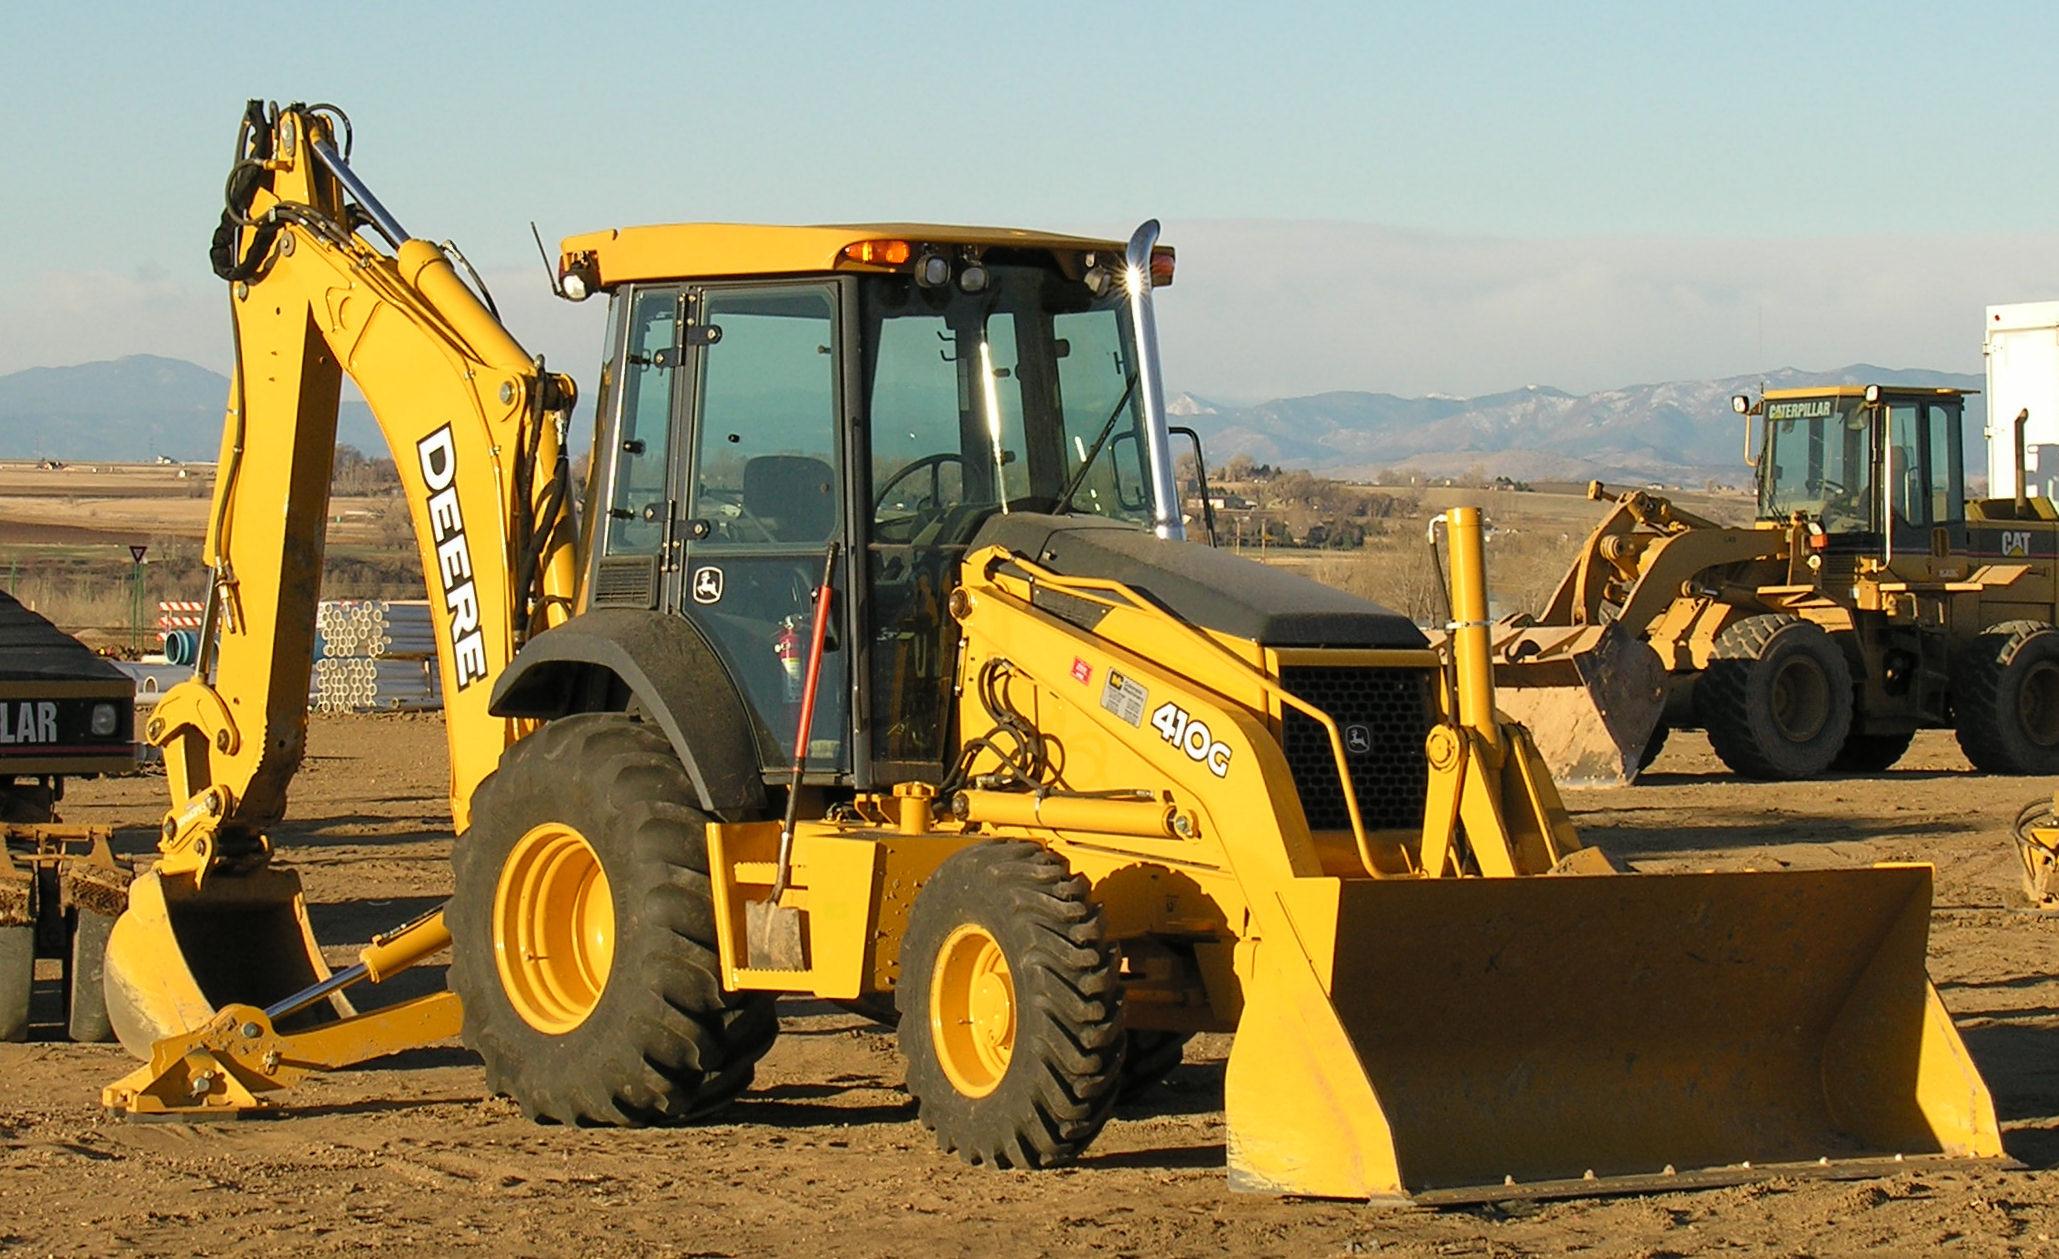 John Deere 410G Backhoe Loader Operators Manual Download - John Deere  Tractors